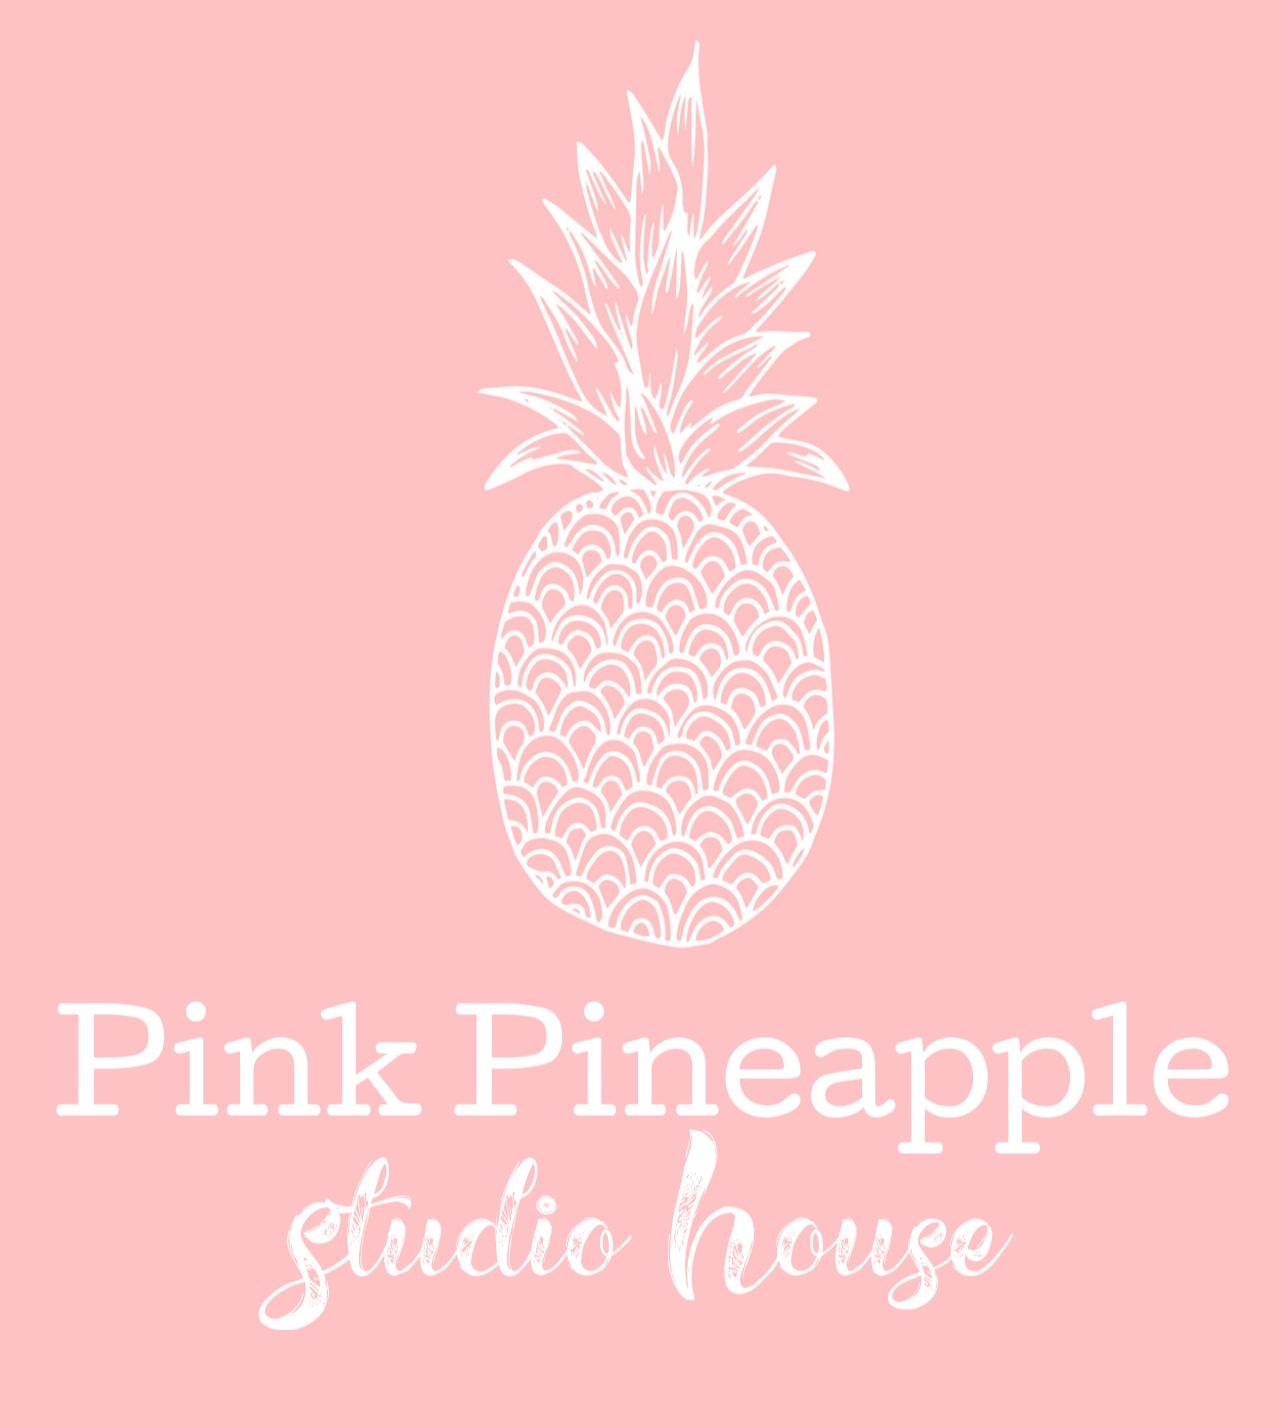 _pink+pineapple+logo.jpg